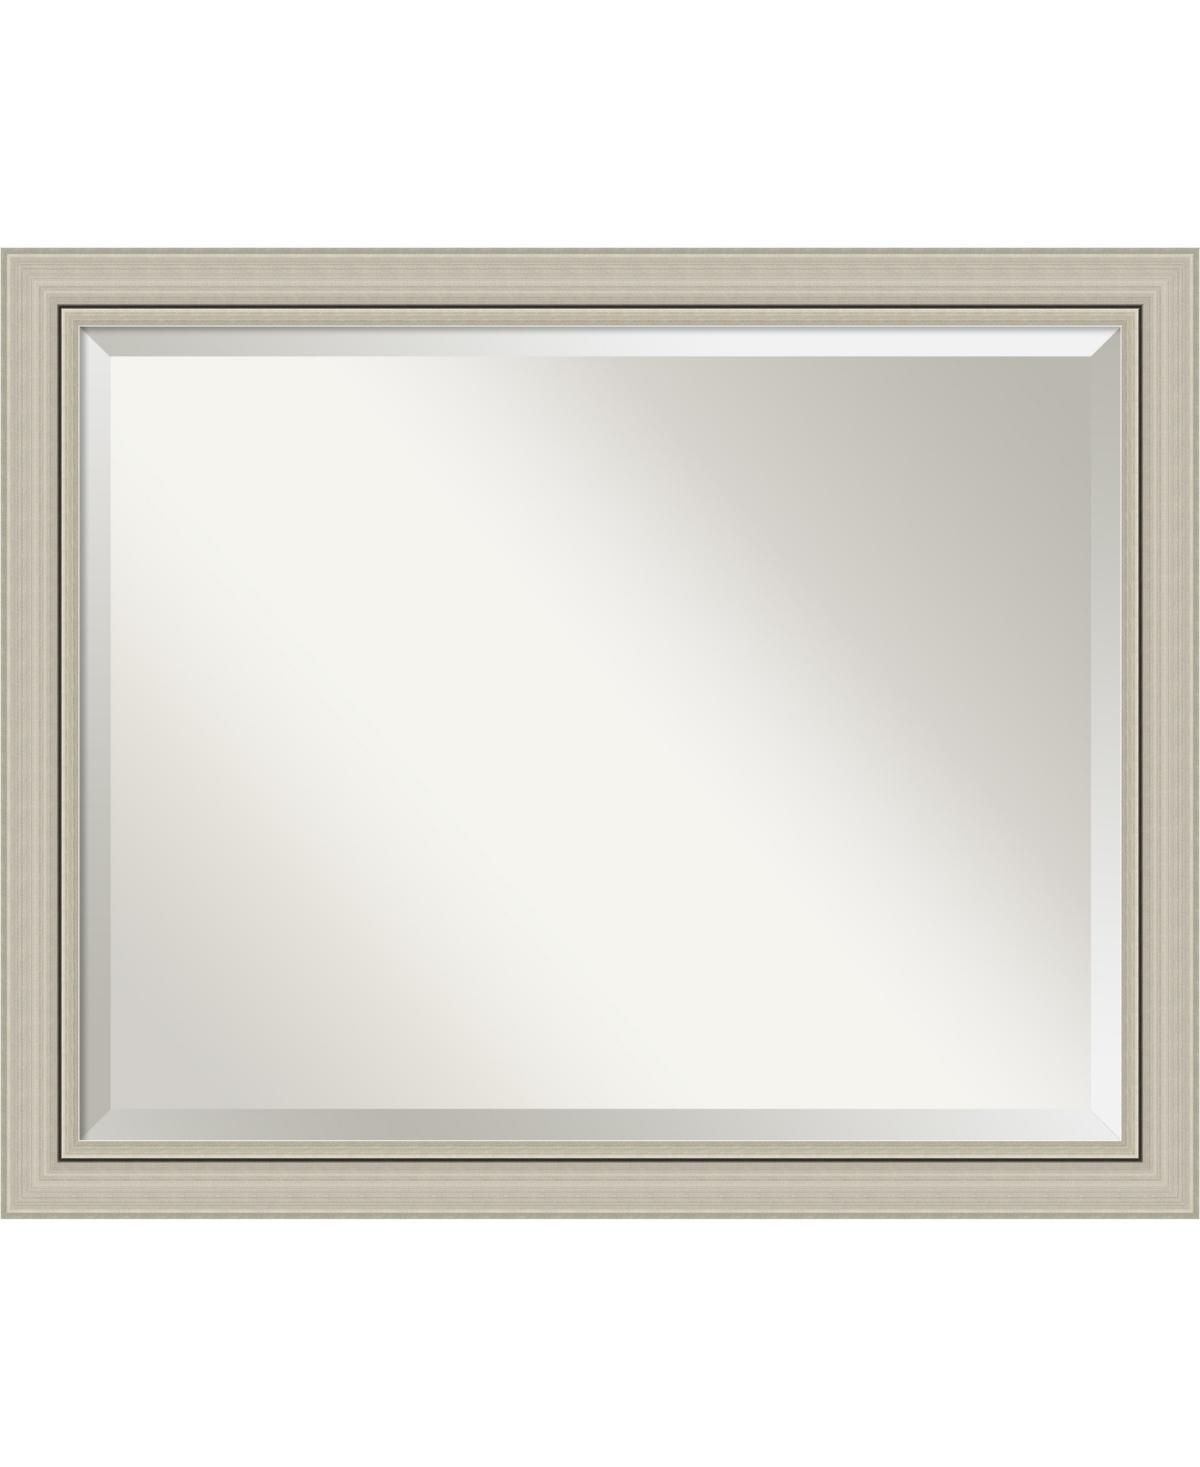 Amanti Art Romano 32x26 Bathroom Mirror